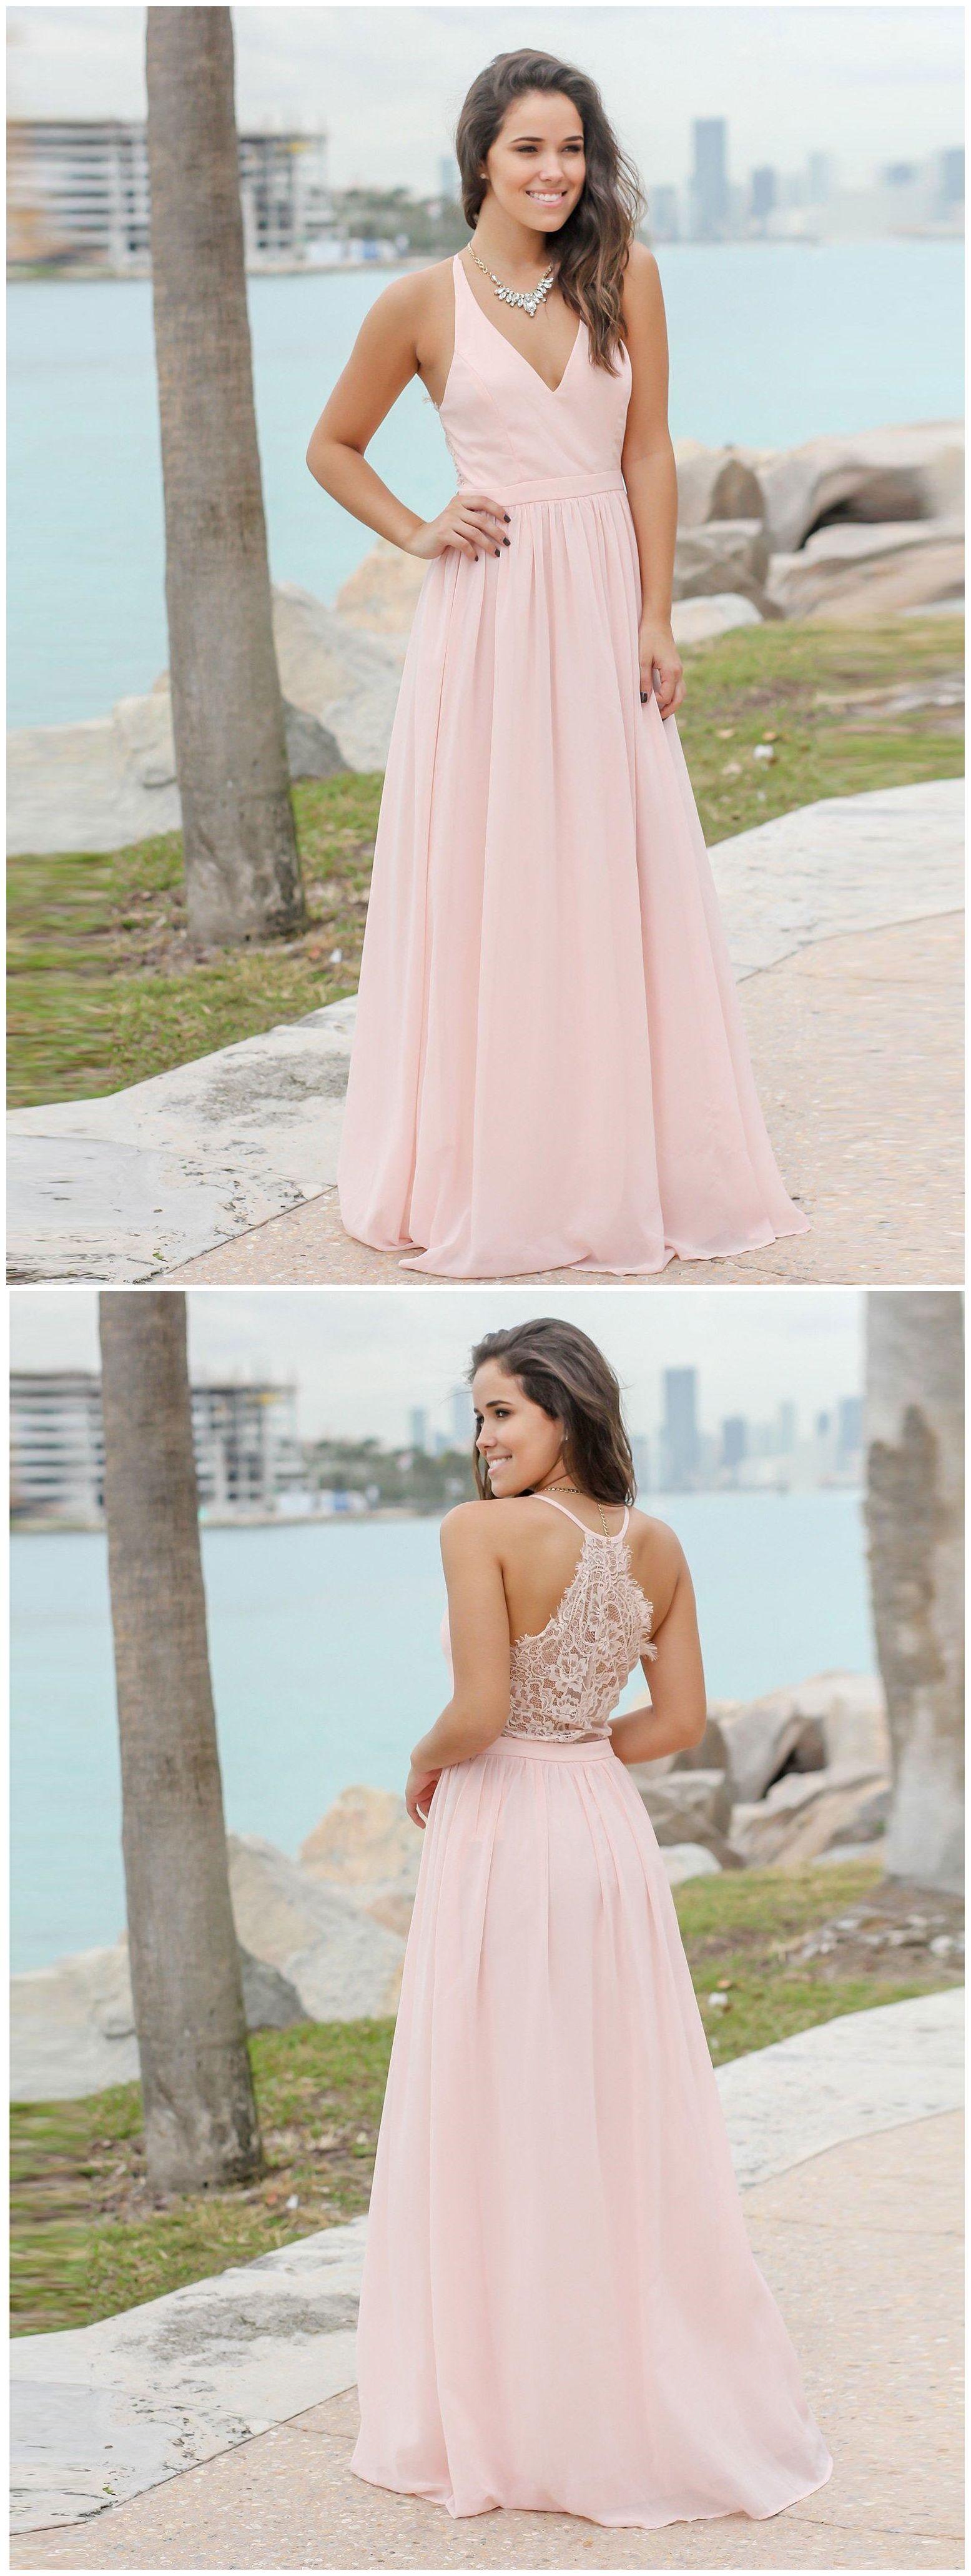 Long formal maternity dresses see through back simple blush